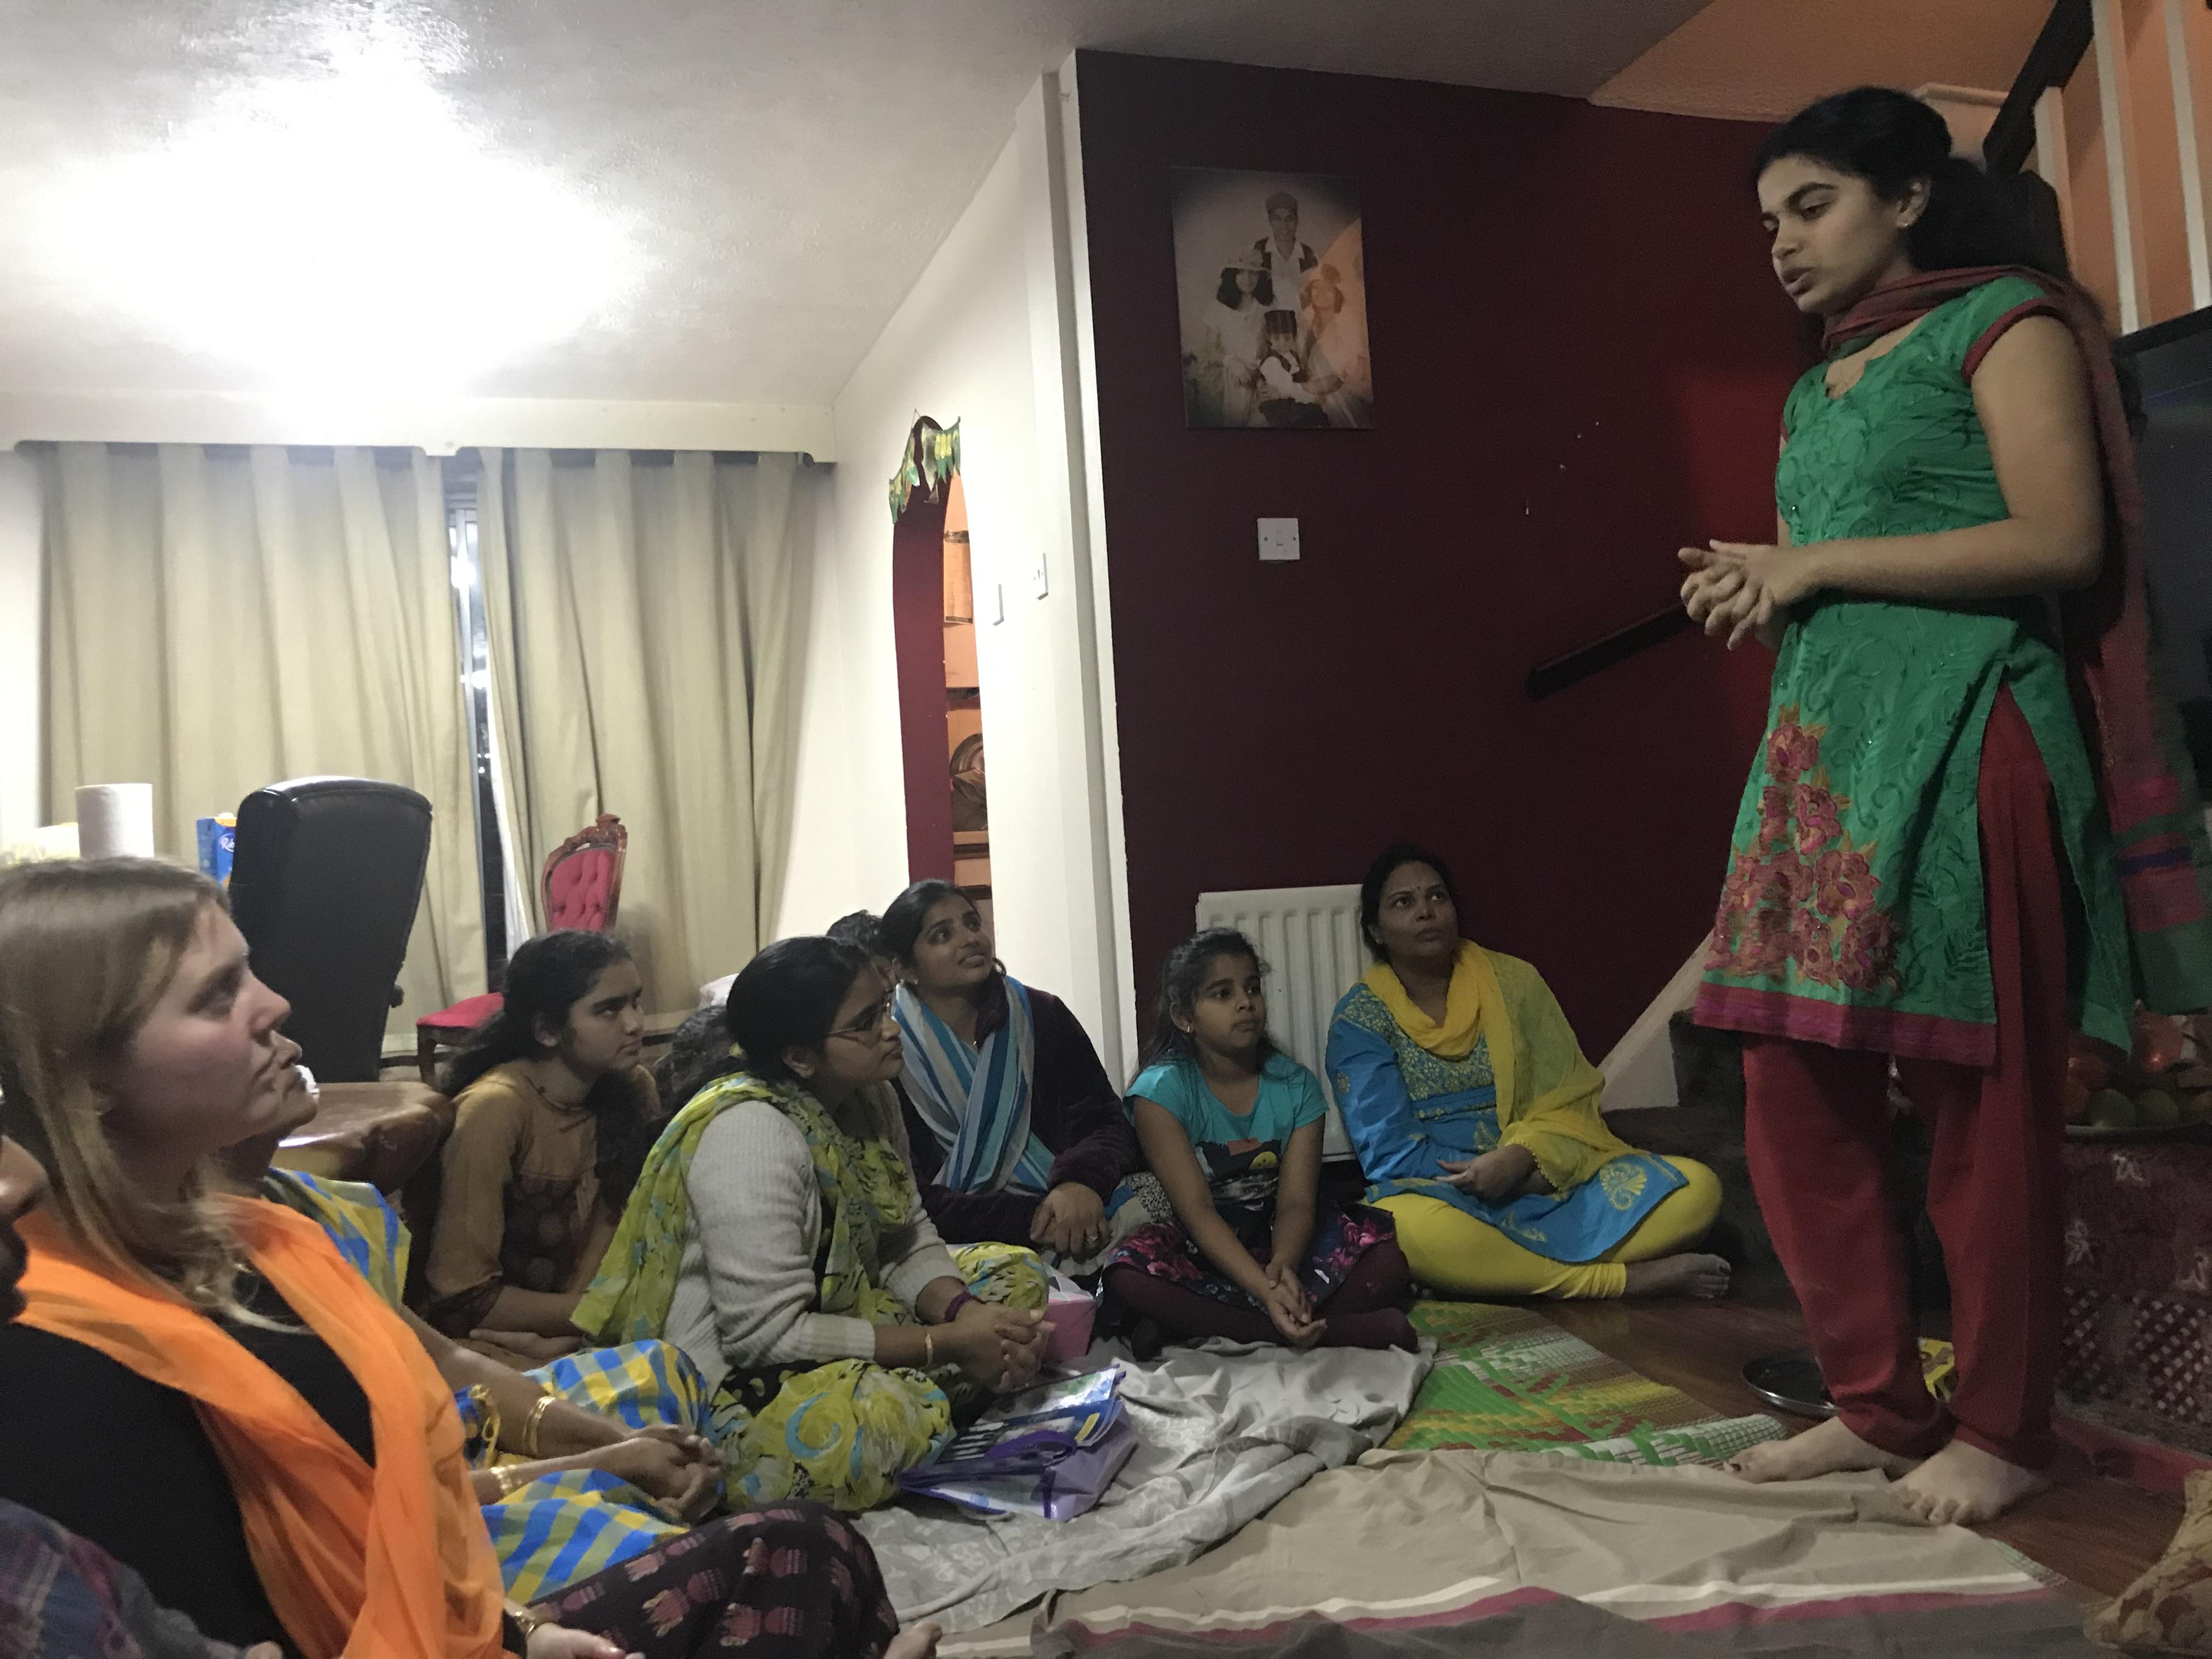 London Aaradhana at Mrs.Gubbala Bagyalakshmi's house on 1st Dec 2018